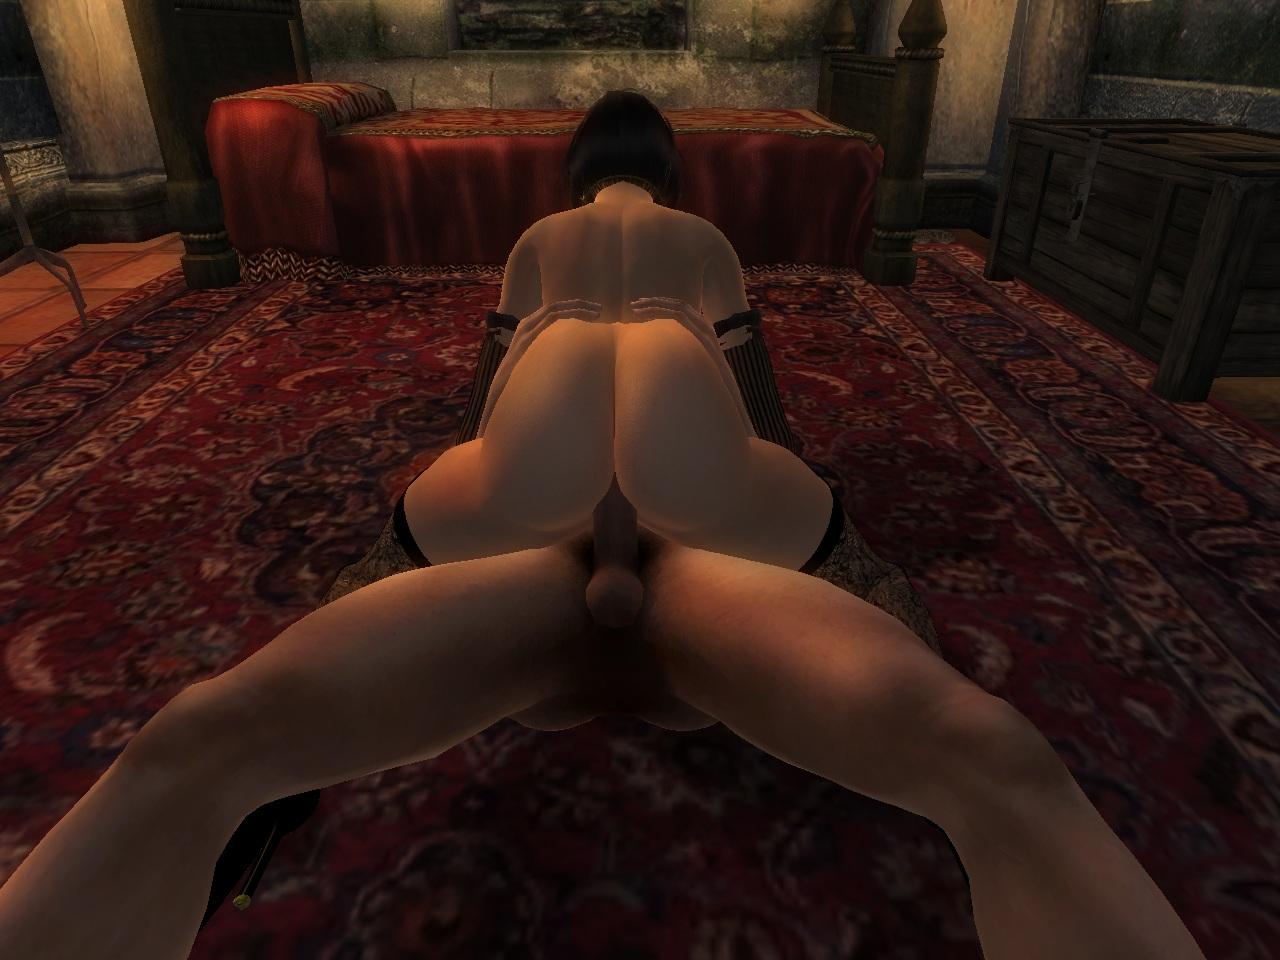 Oblivion sex animations mod nude usa girl